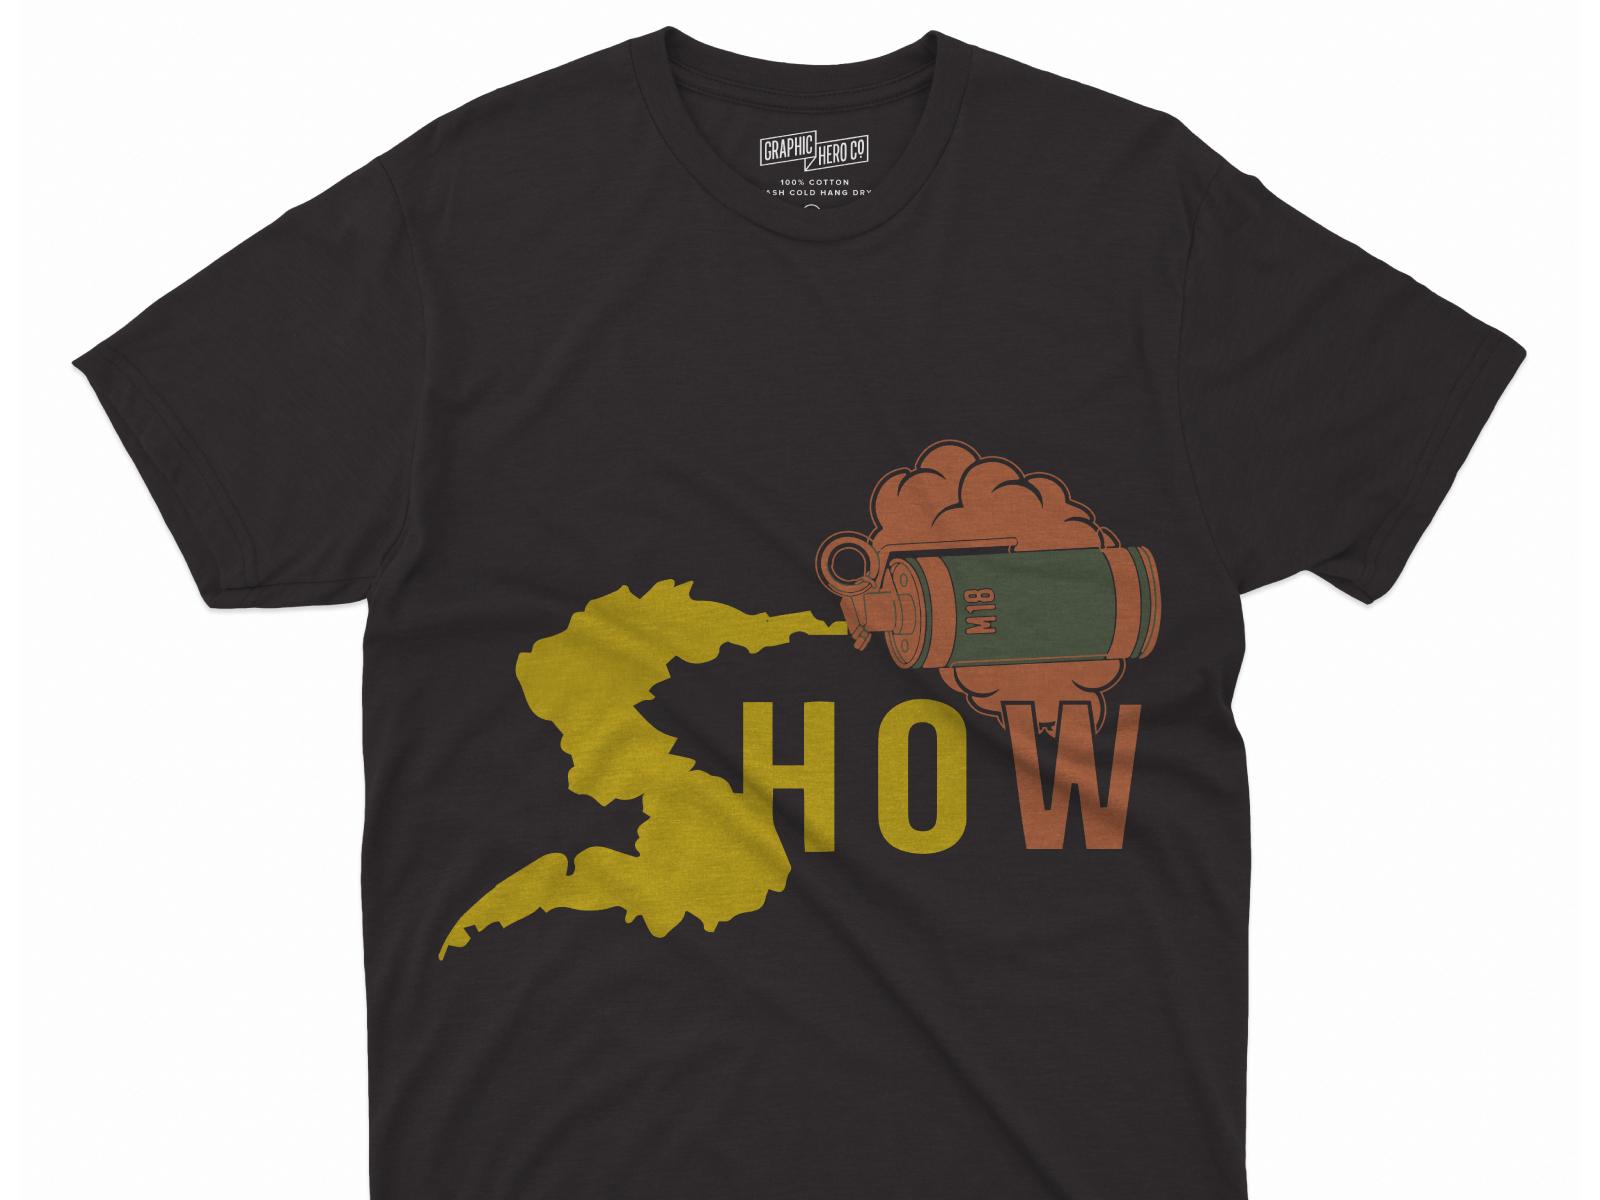 I will professionally design custom,  trendy t-shirt